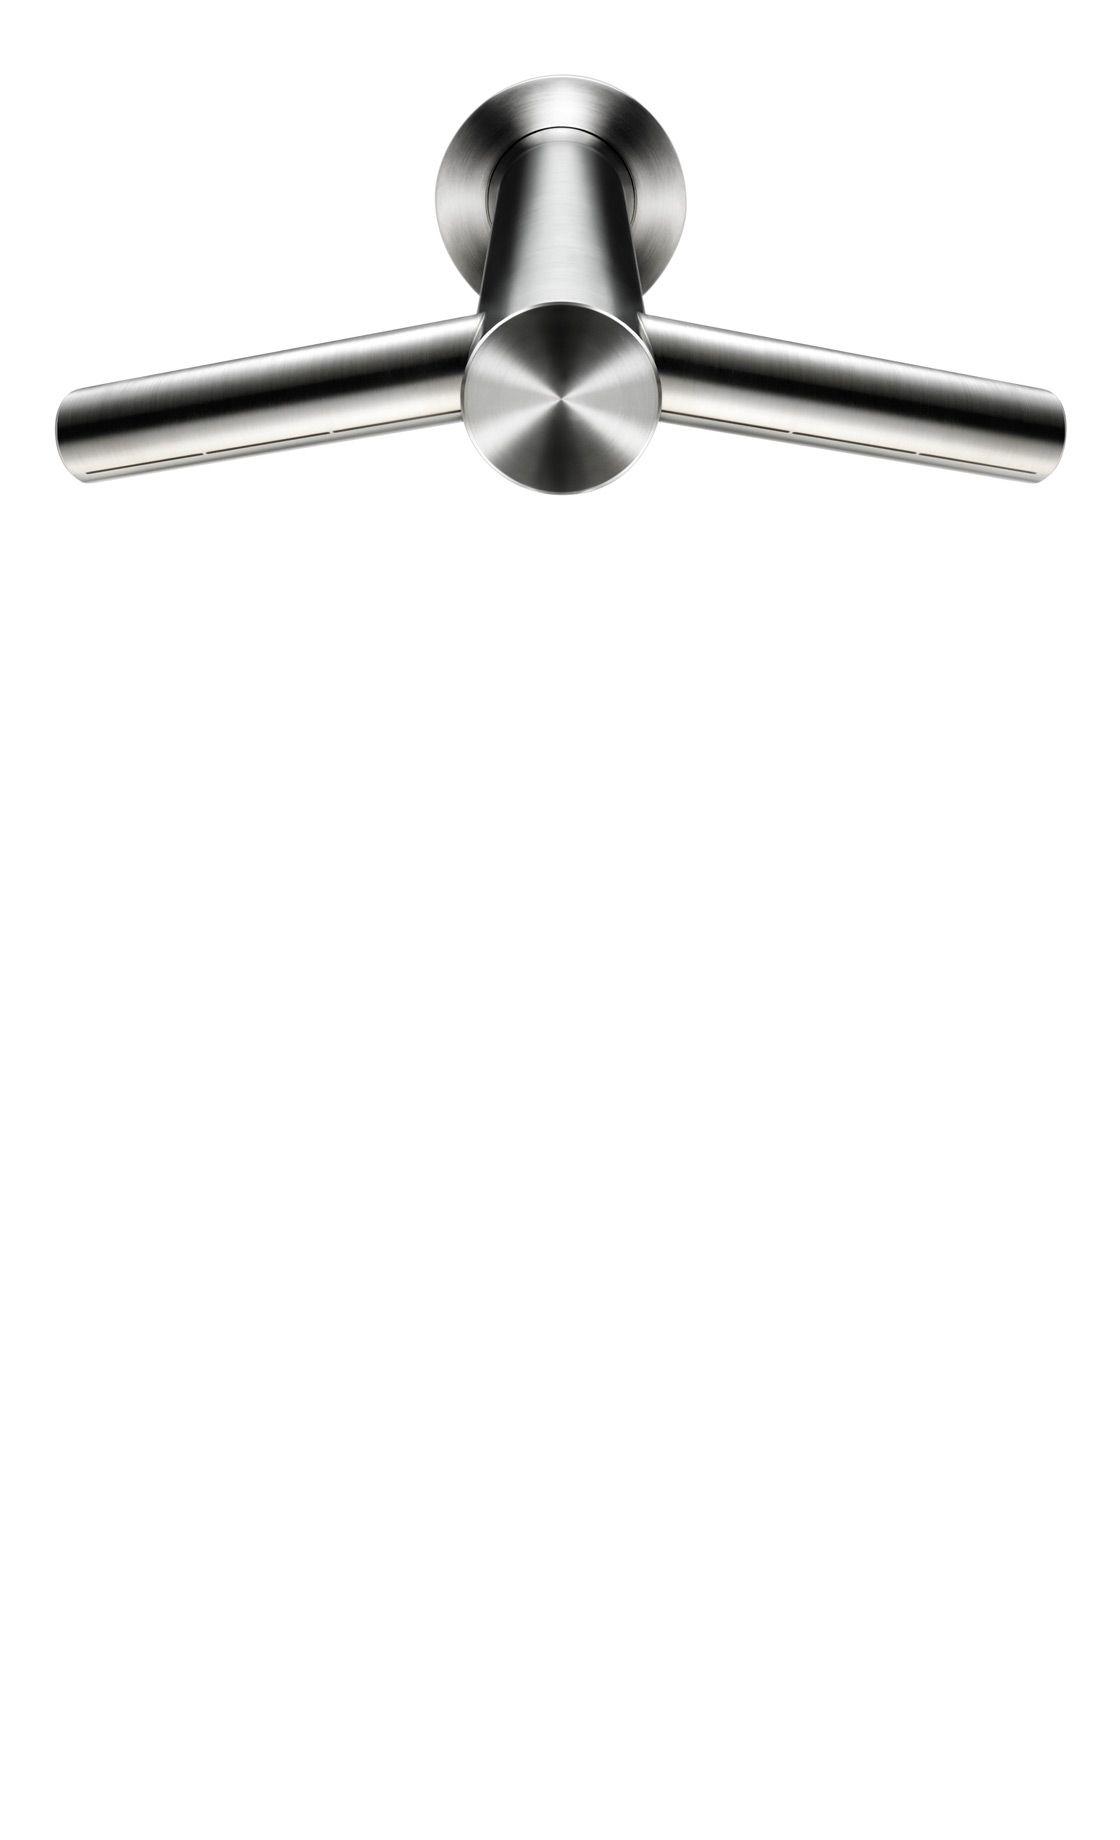 Ab11 dyson airblade tap отзывы о дайсон v10